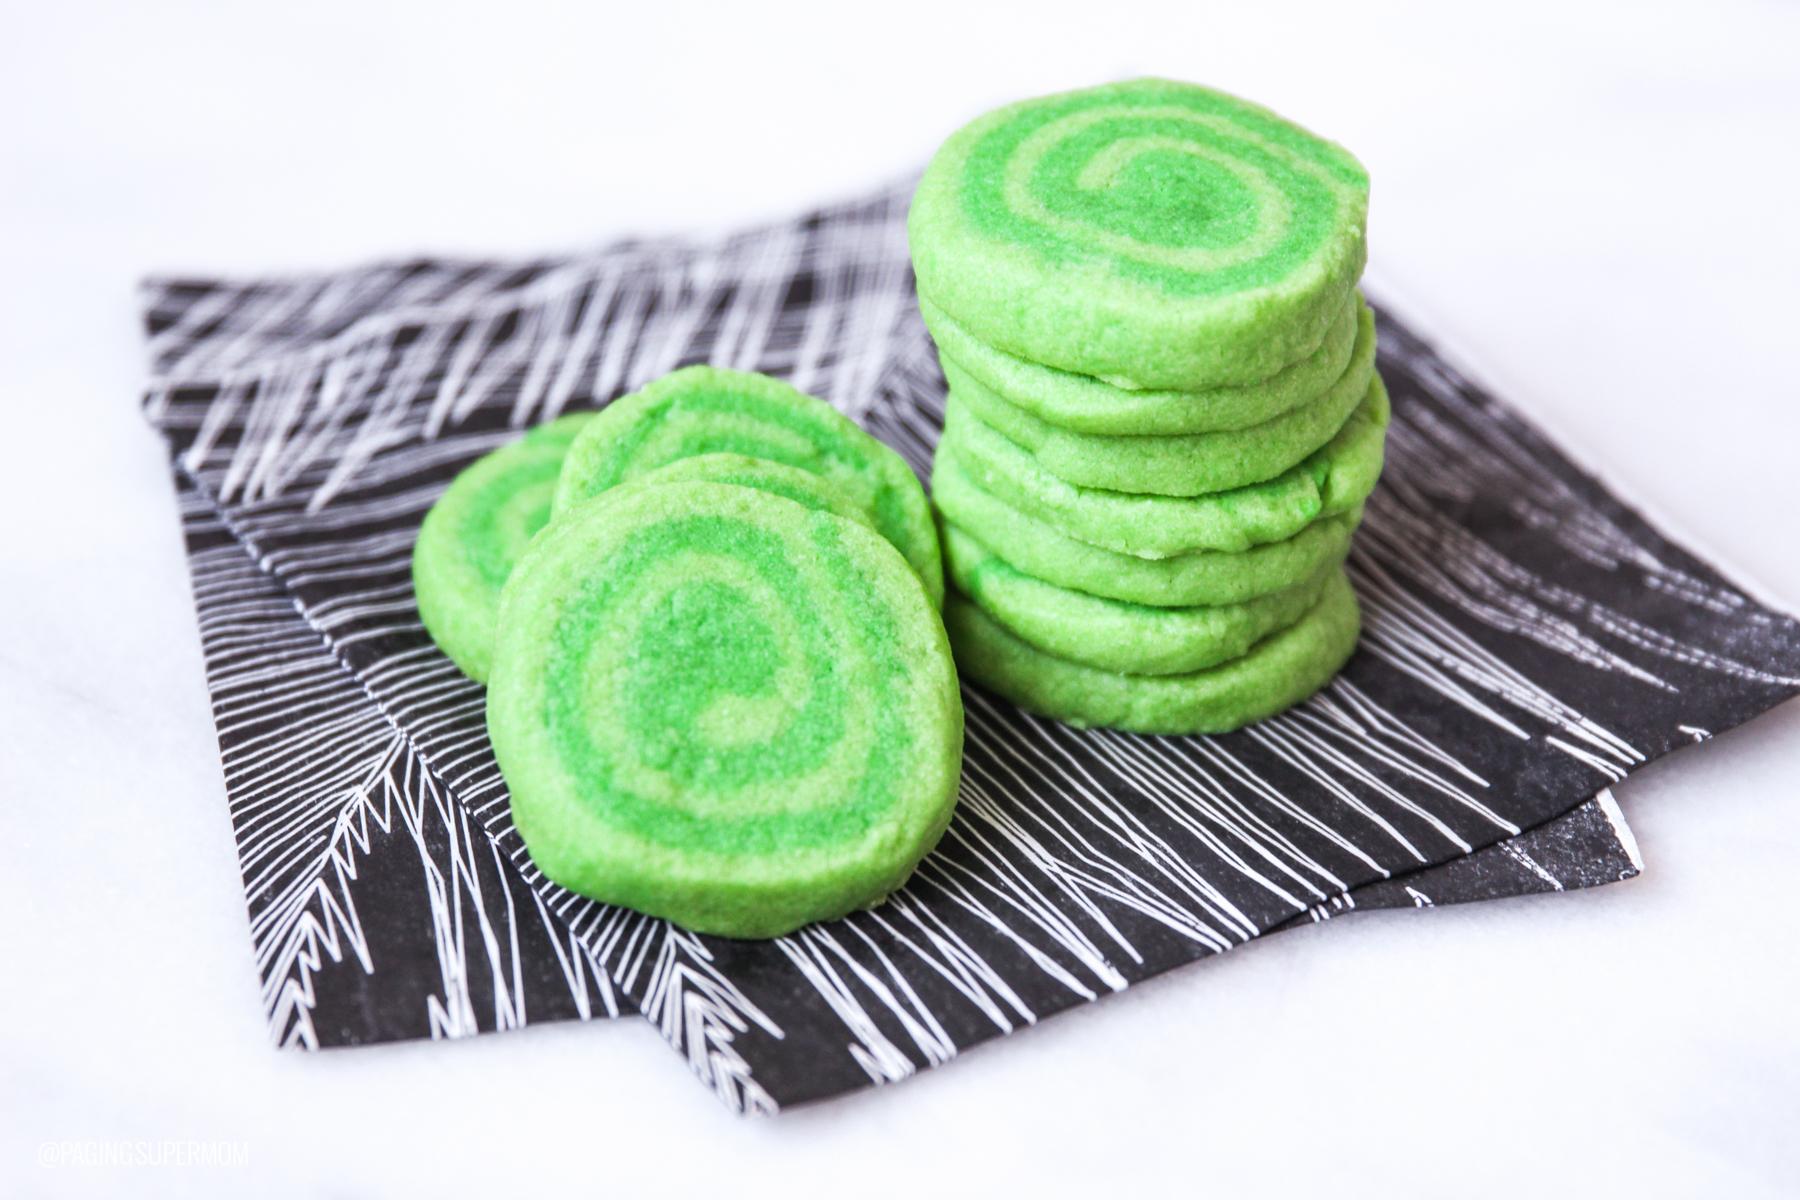 Recipe for Moana Heart of Te Fiti Cookies @PagingSupermom